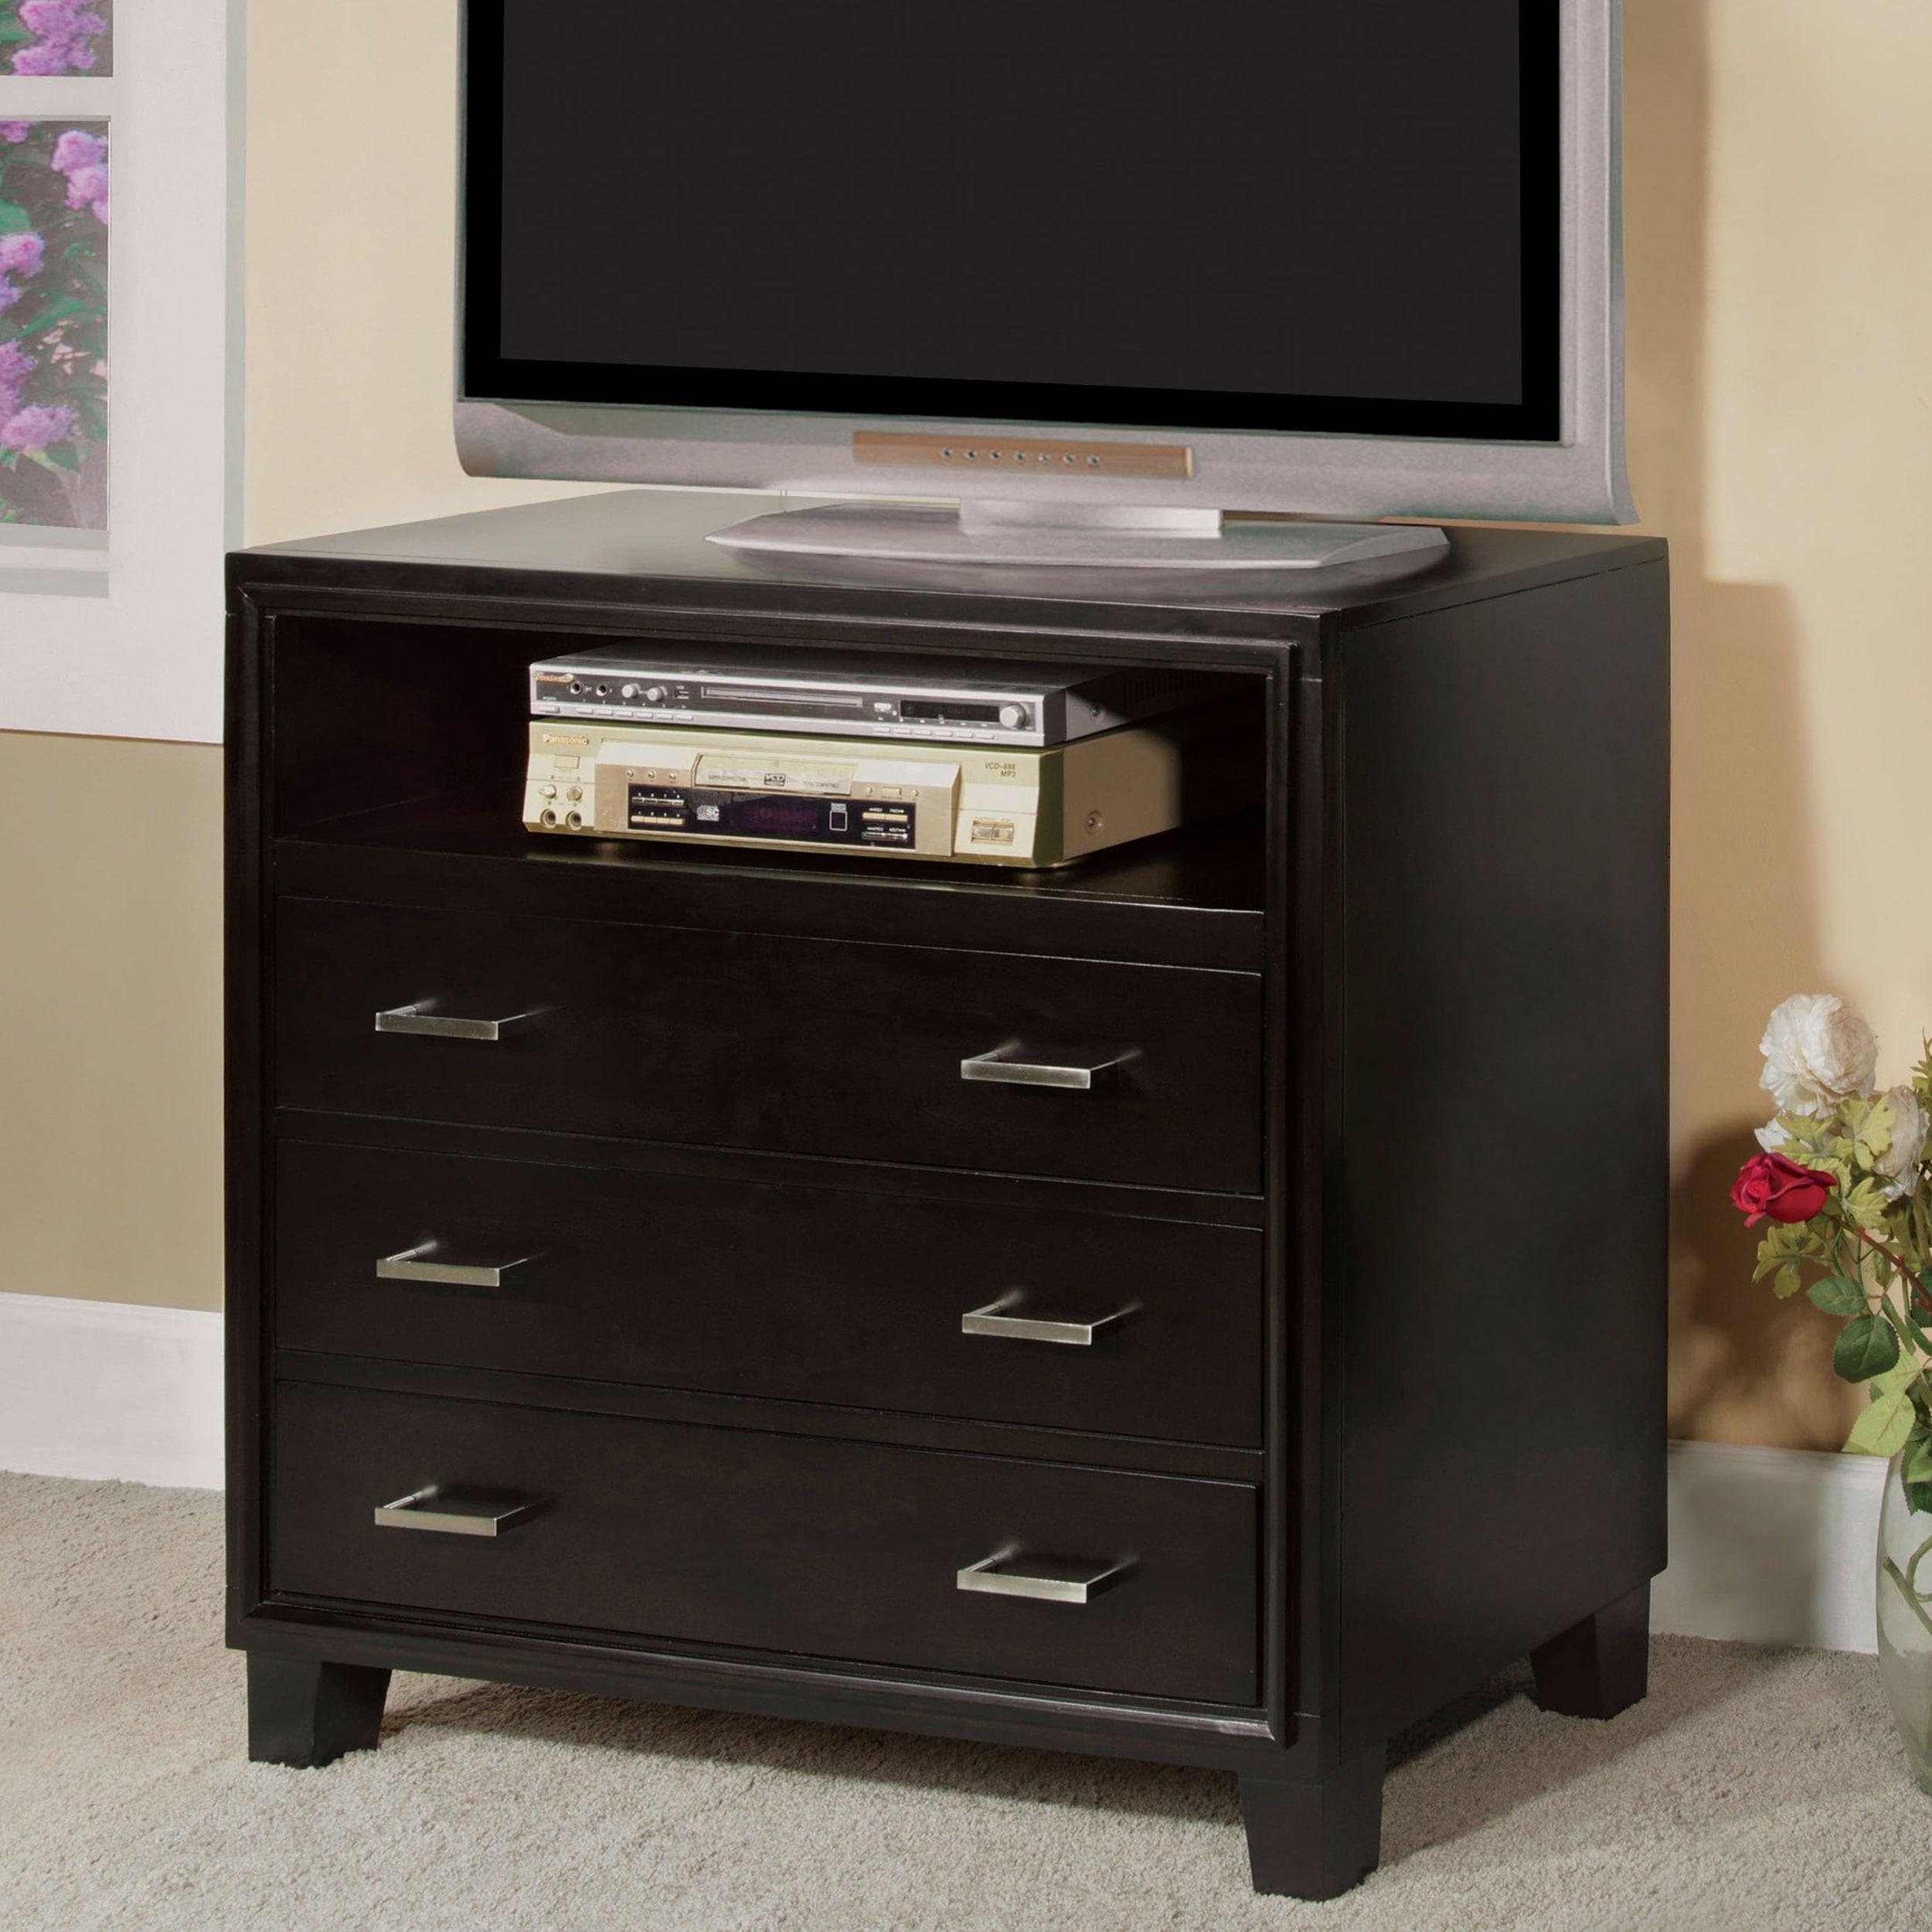 Furniture of America Elrich Modern Espresso 3-Drawer Medi...